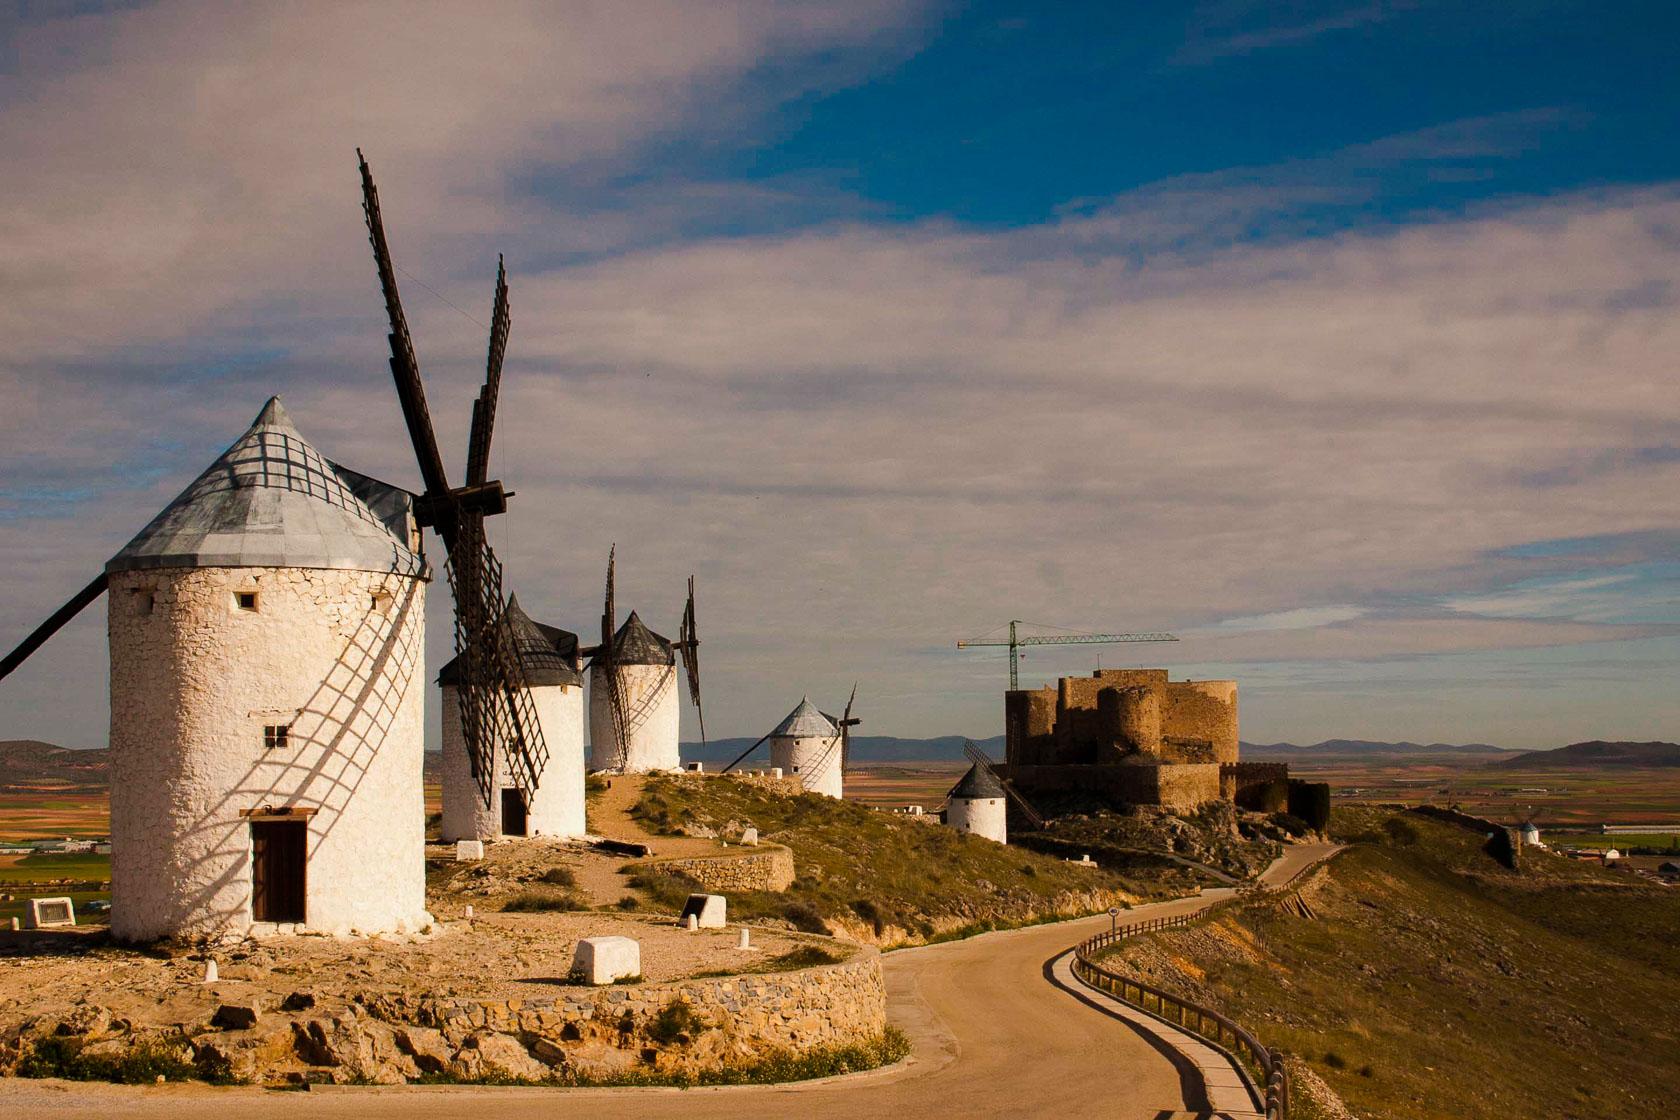 Madrid / Segovia Area 2012